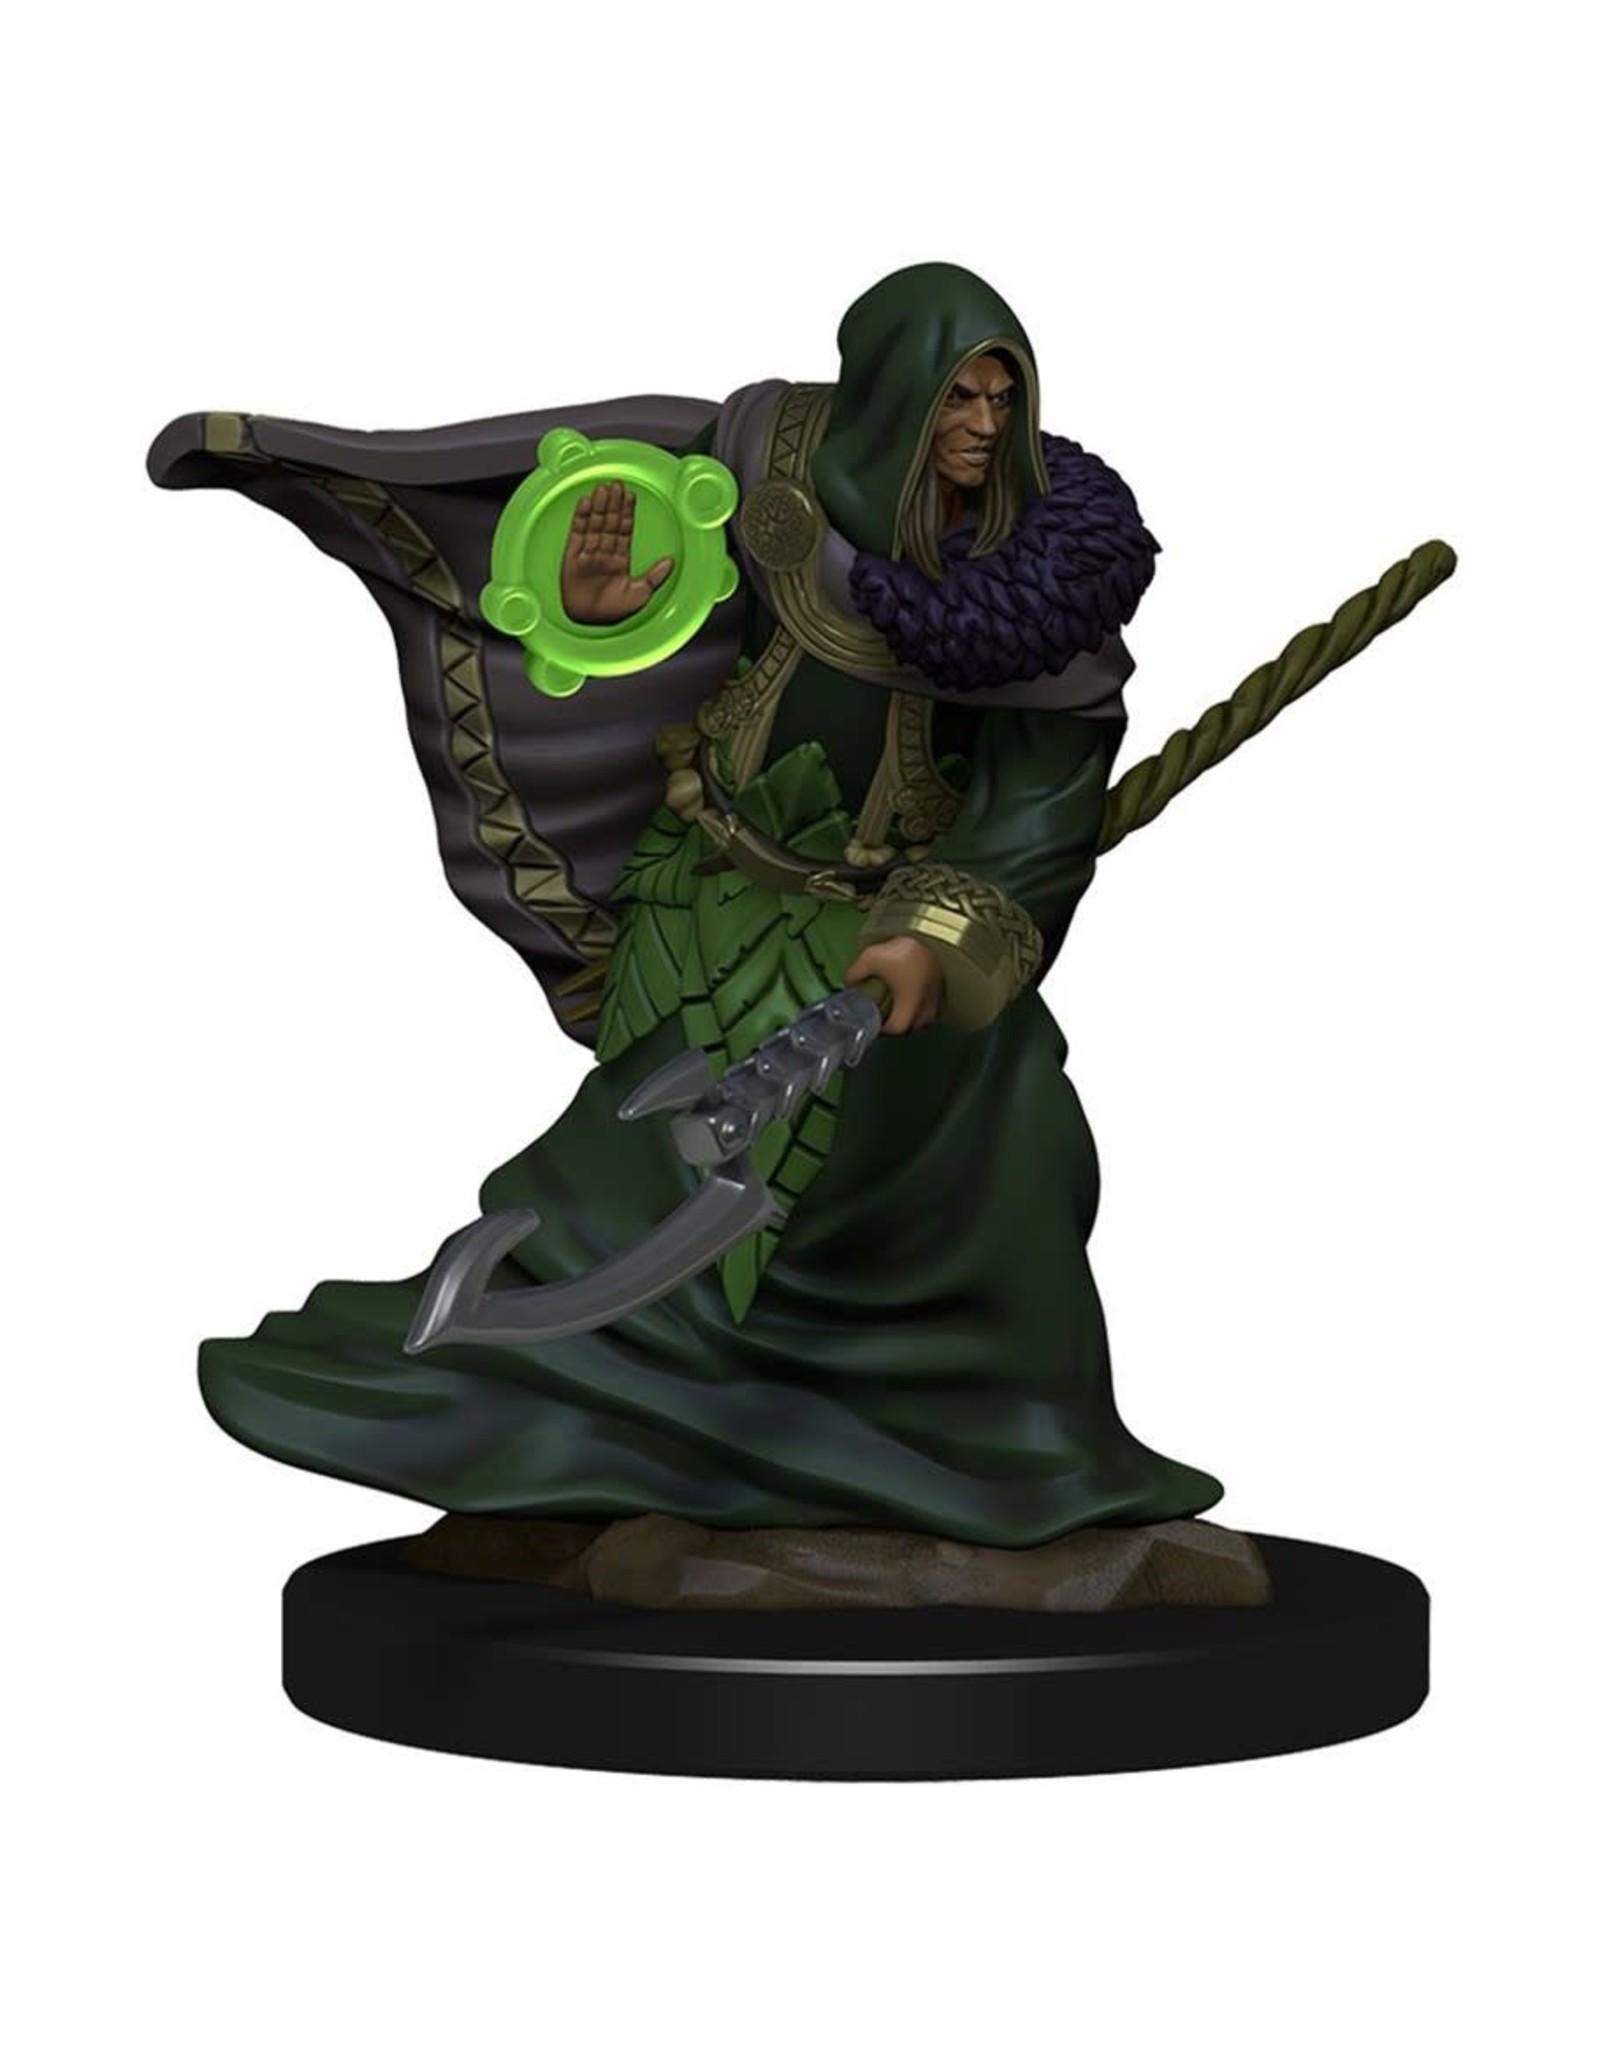 Wizkids Elf Druid Male W5 Icons of the Realms Premium Figures - D&D Minis